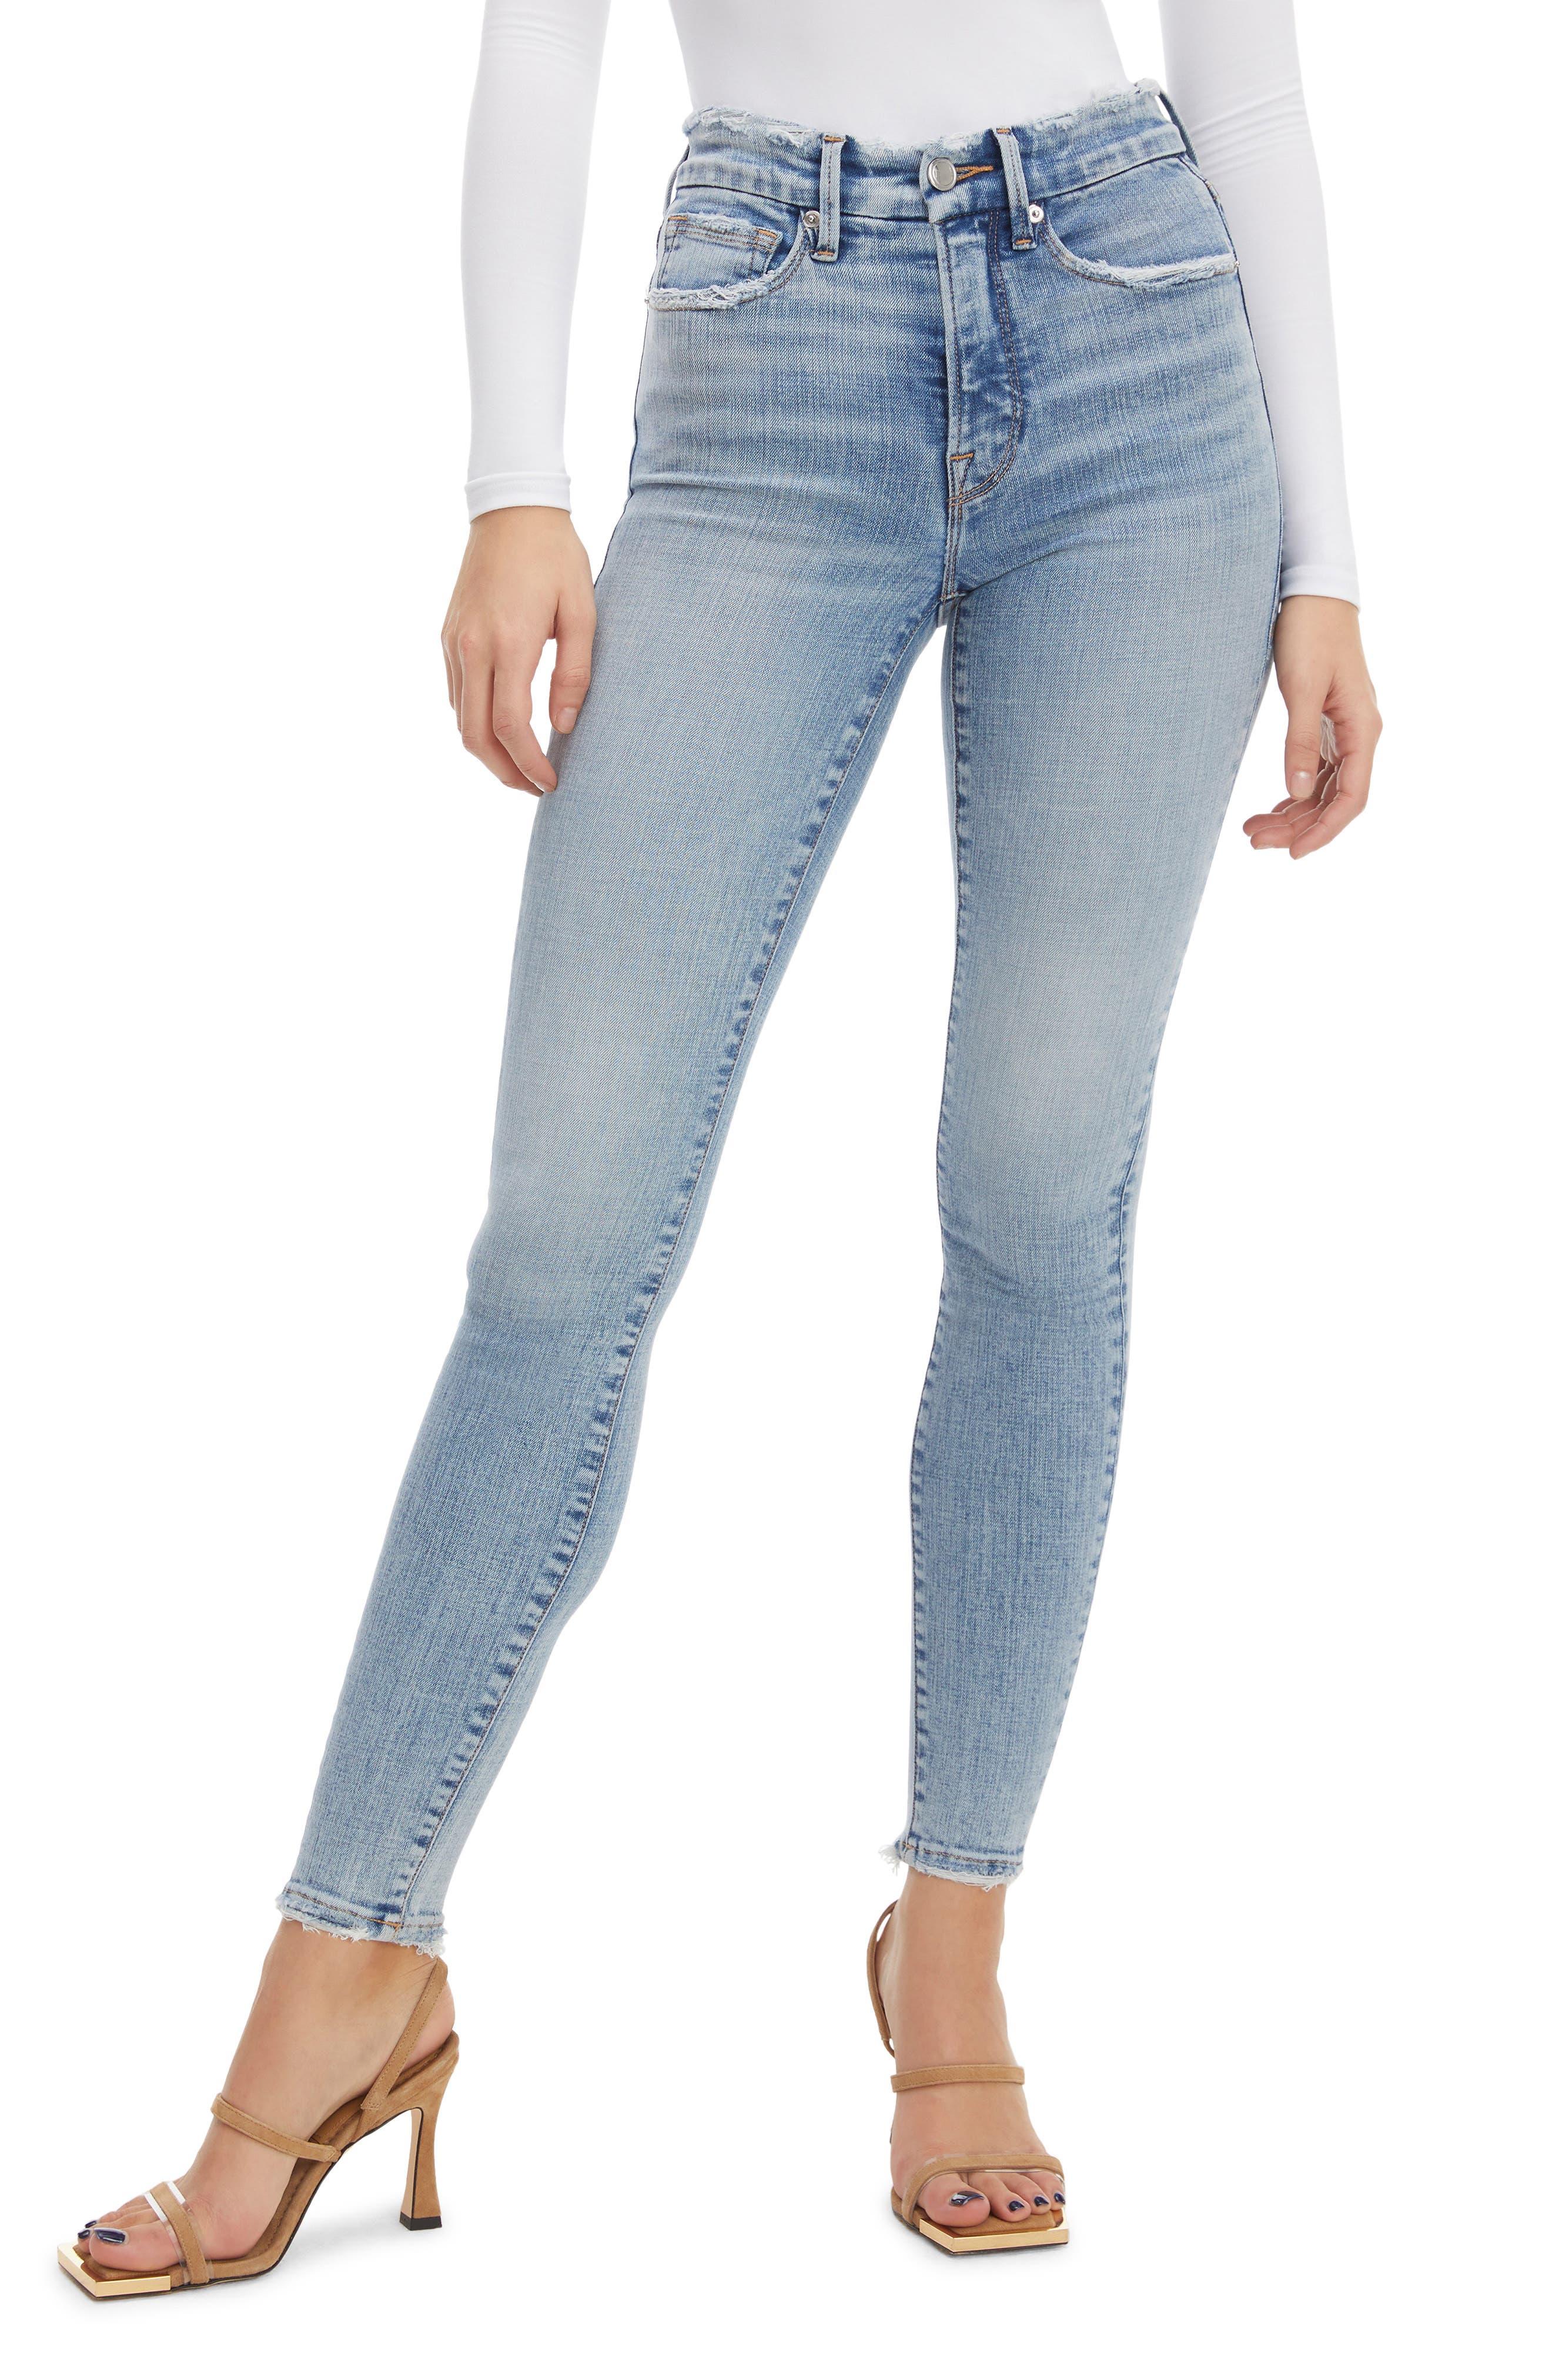 Plus Women's Good American Good Legs Destroyed Hem Ankle Skinny Jeans